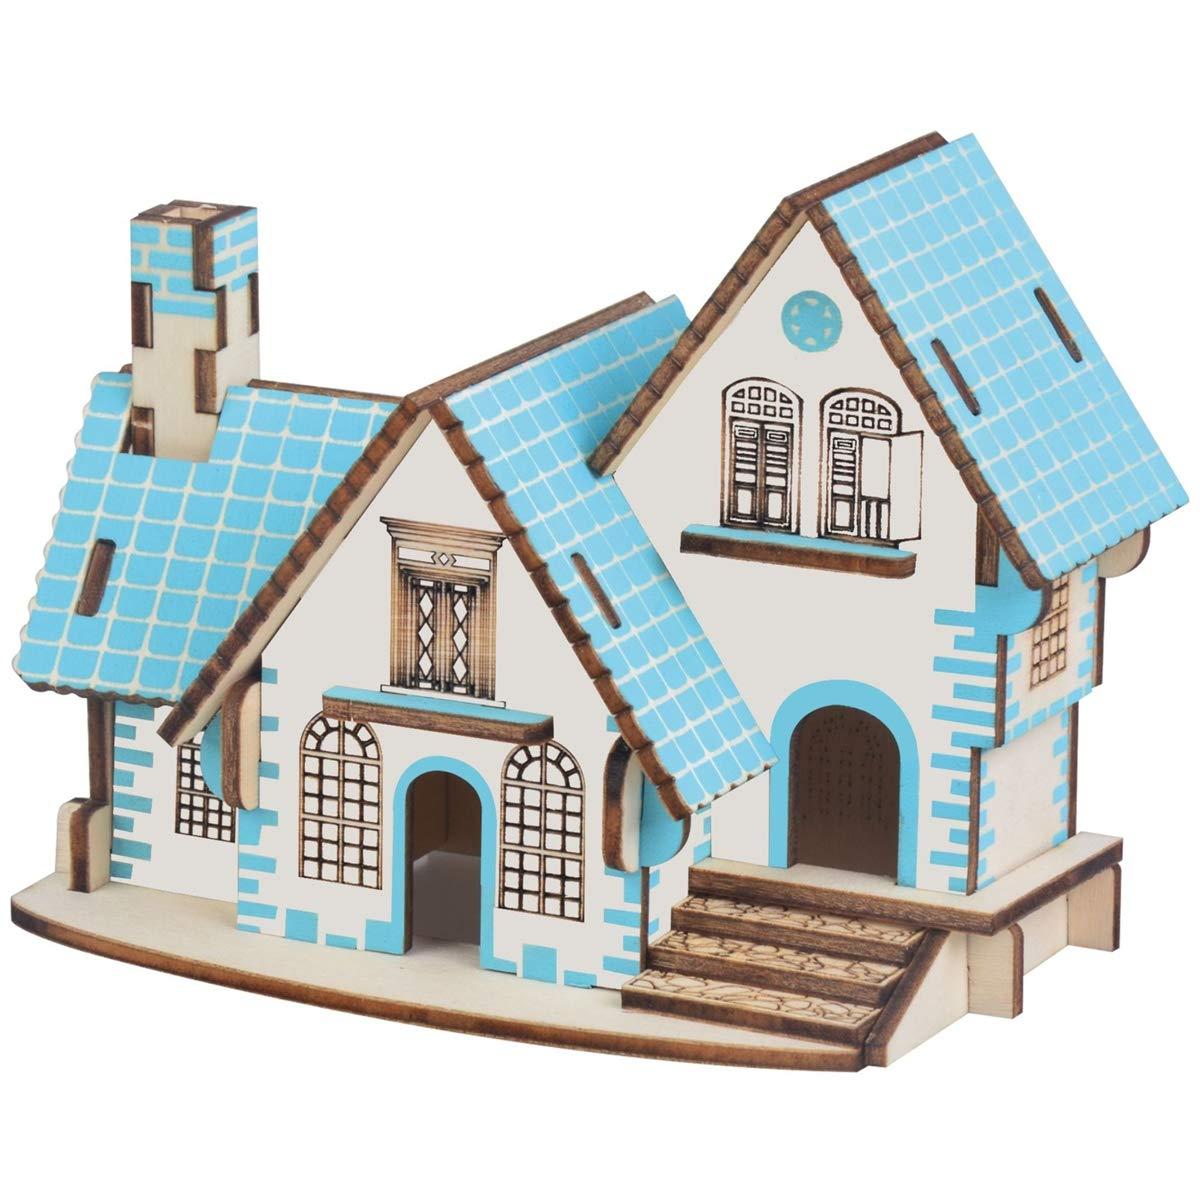 LSQR DIY Holz 3D Jigsaw Handmade Handmade Handmade Puzzle Toys, Colorful Power Blue House Dreidimensionales Simulation Bildungsmodell, Kinder Geburtstag ac5668